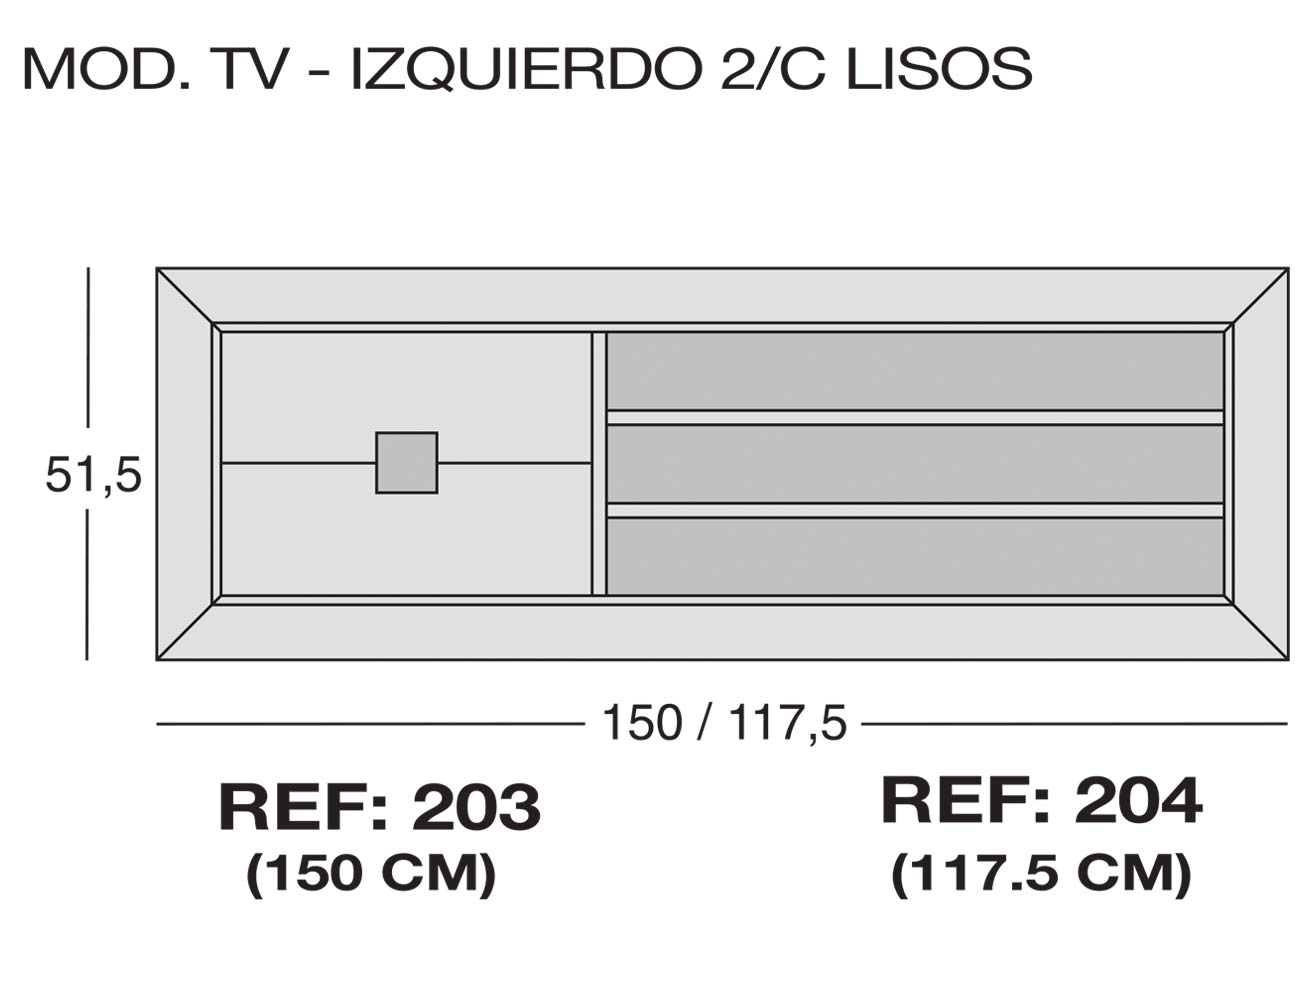 Modulo tv izquierdo 2c lisos 203 2041